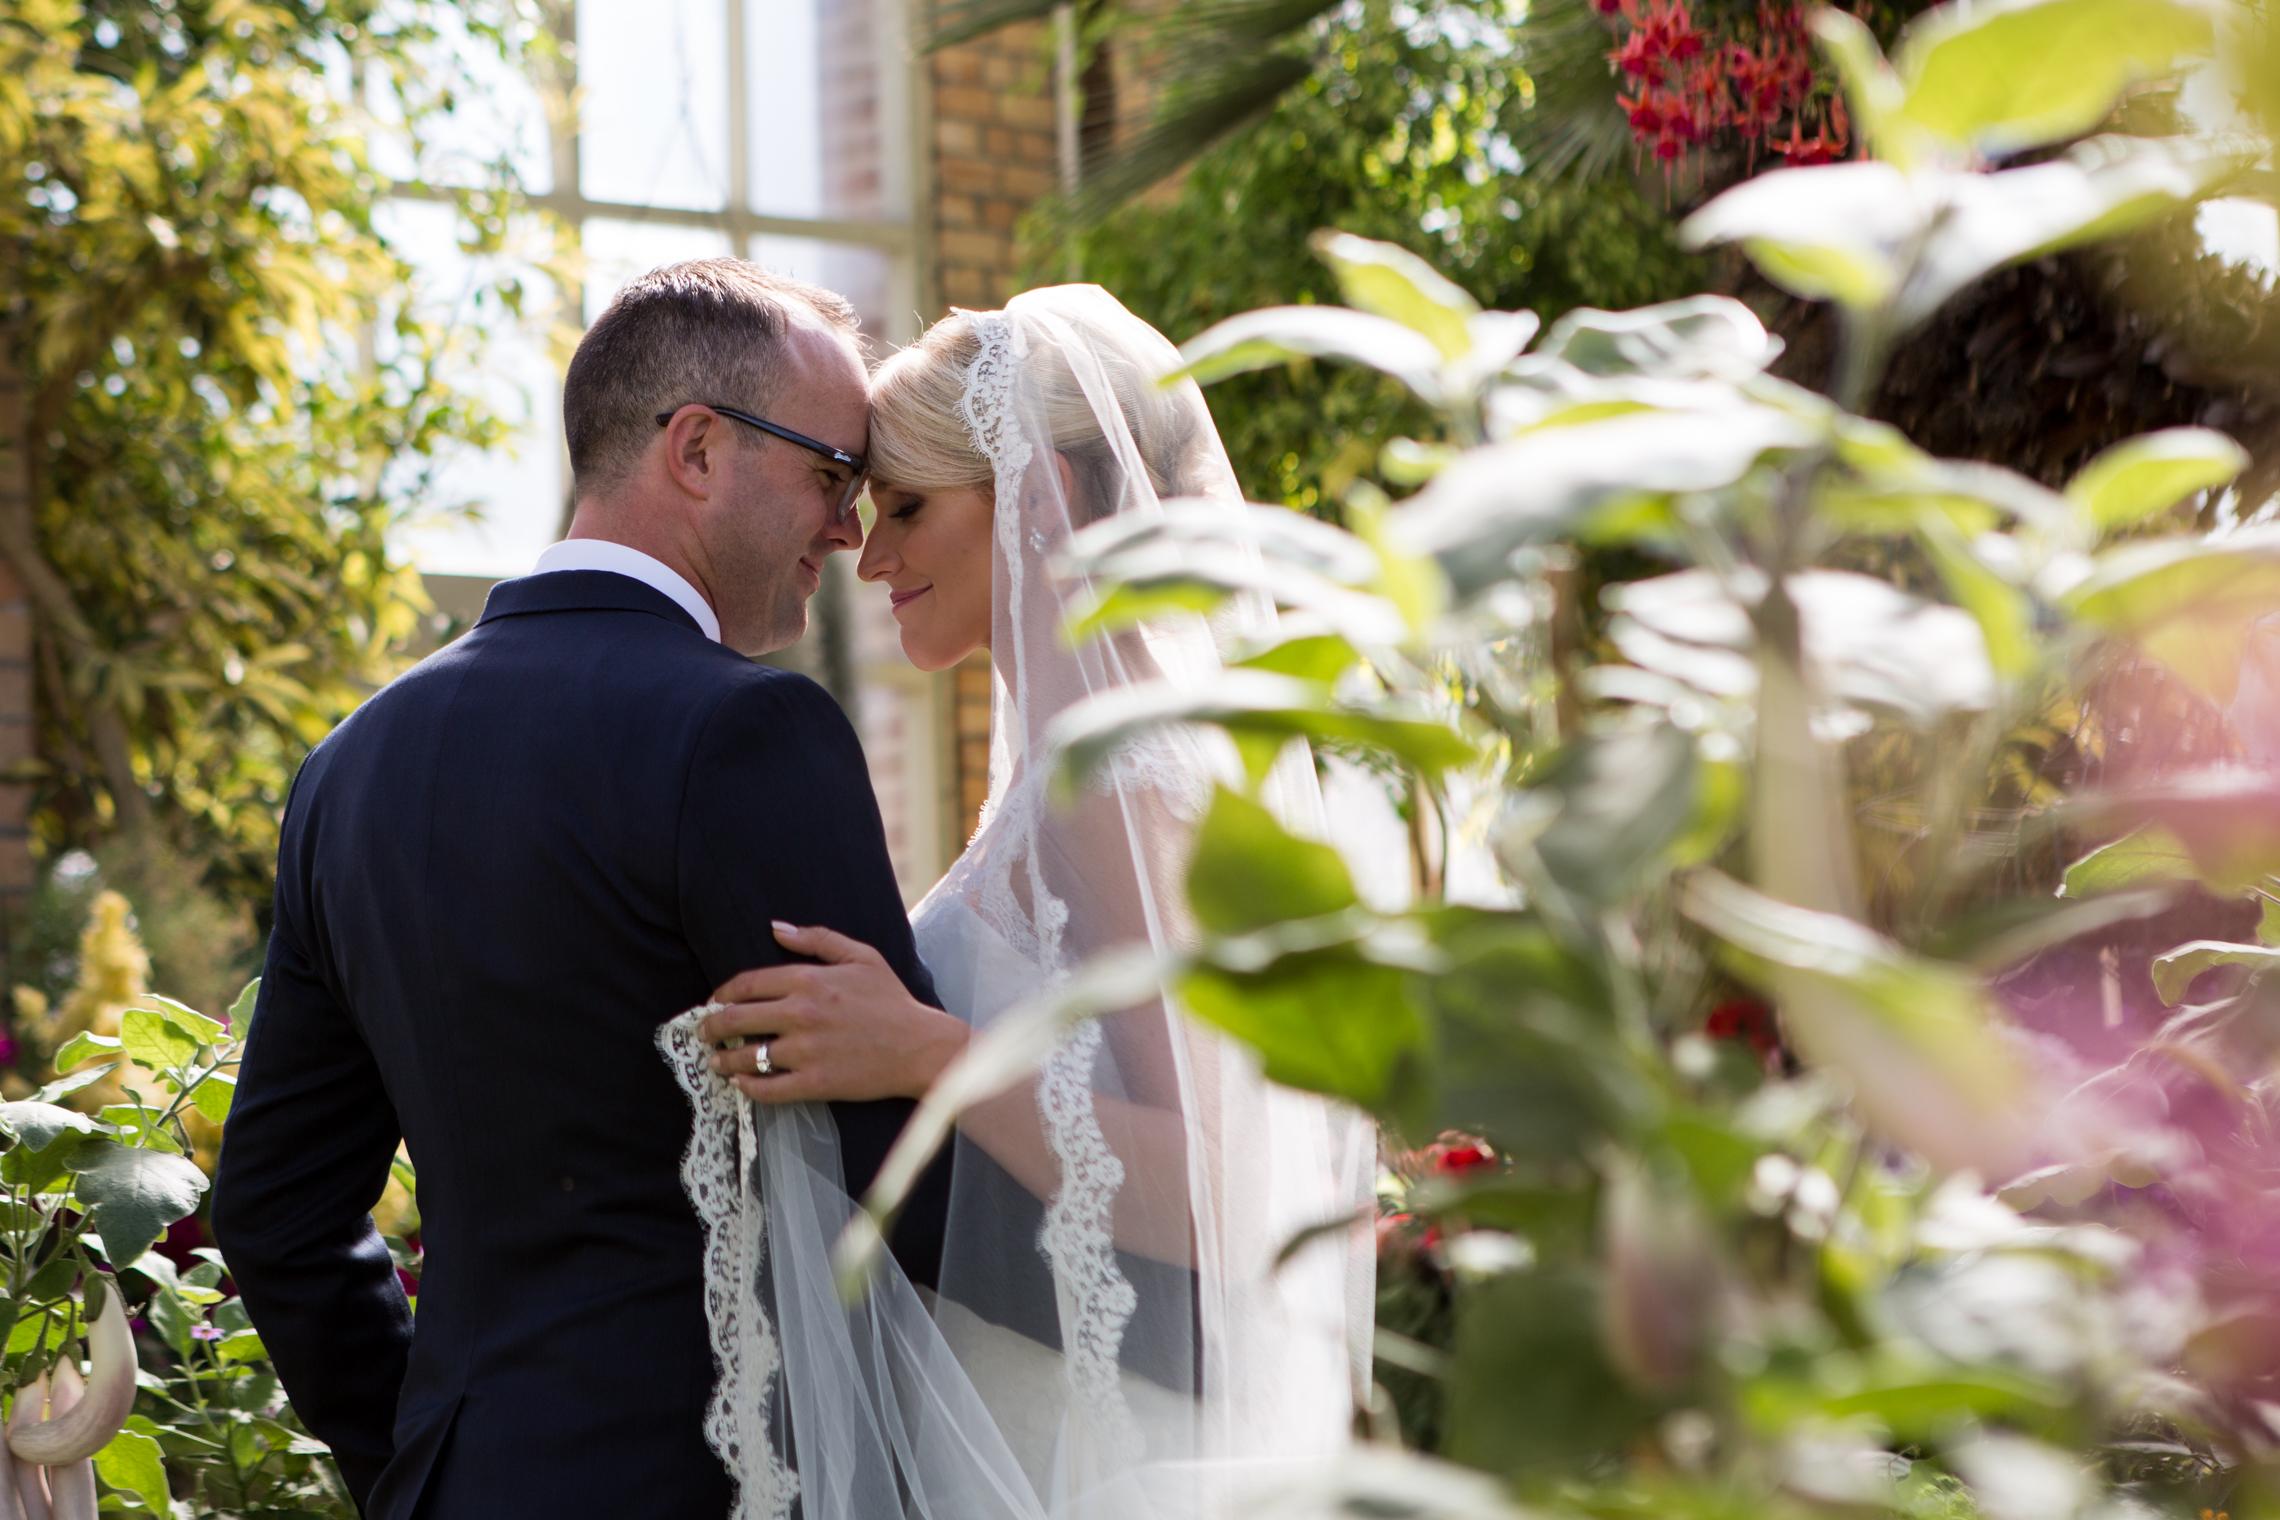 Wedding photographer Auckland testimonial-1